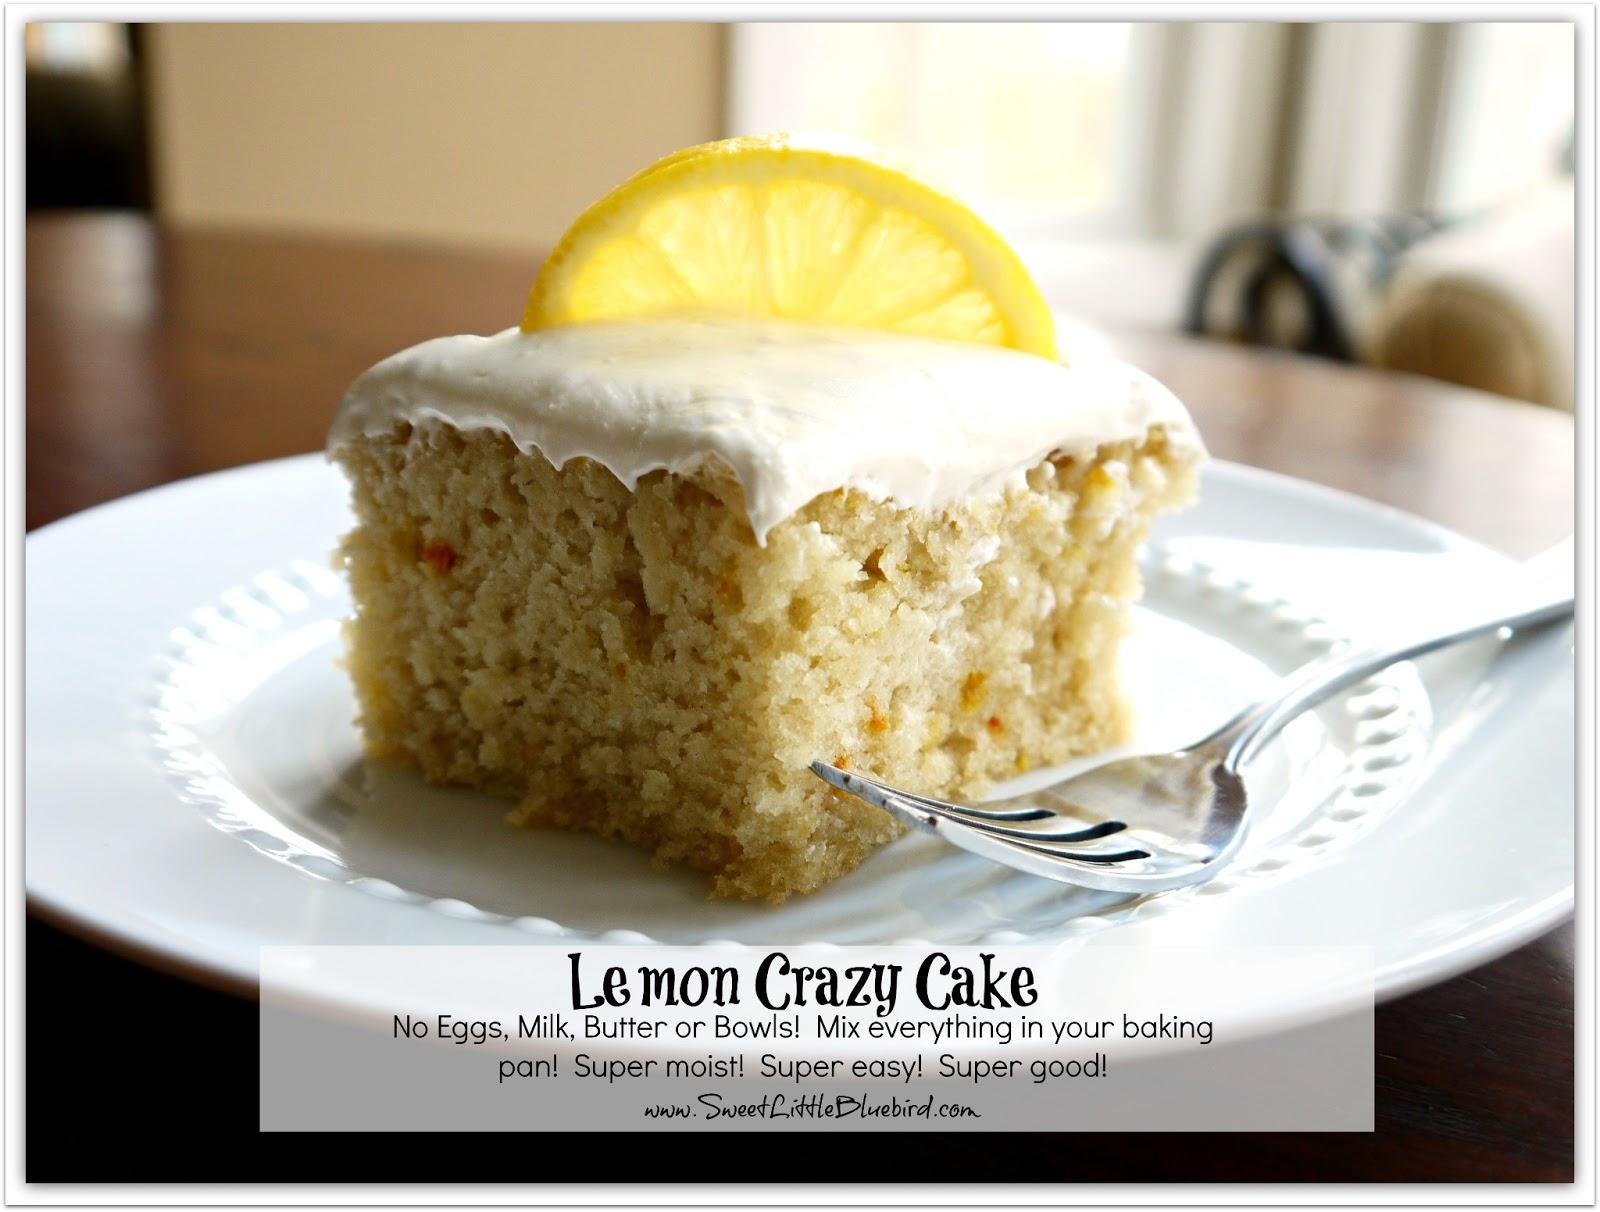 Lemon Crazy Wacky Cake